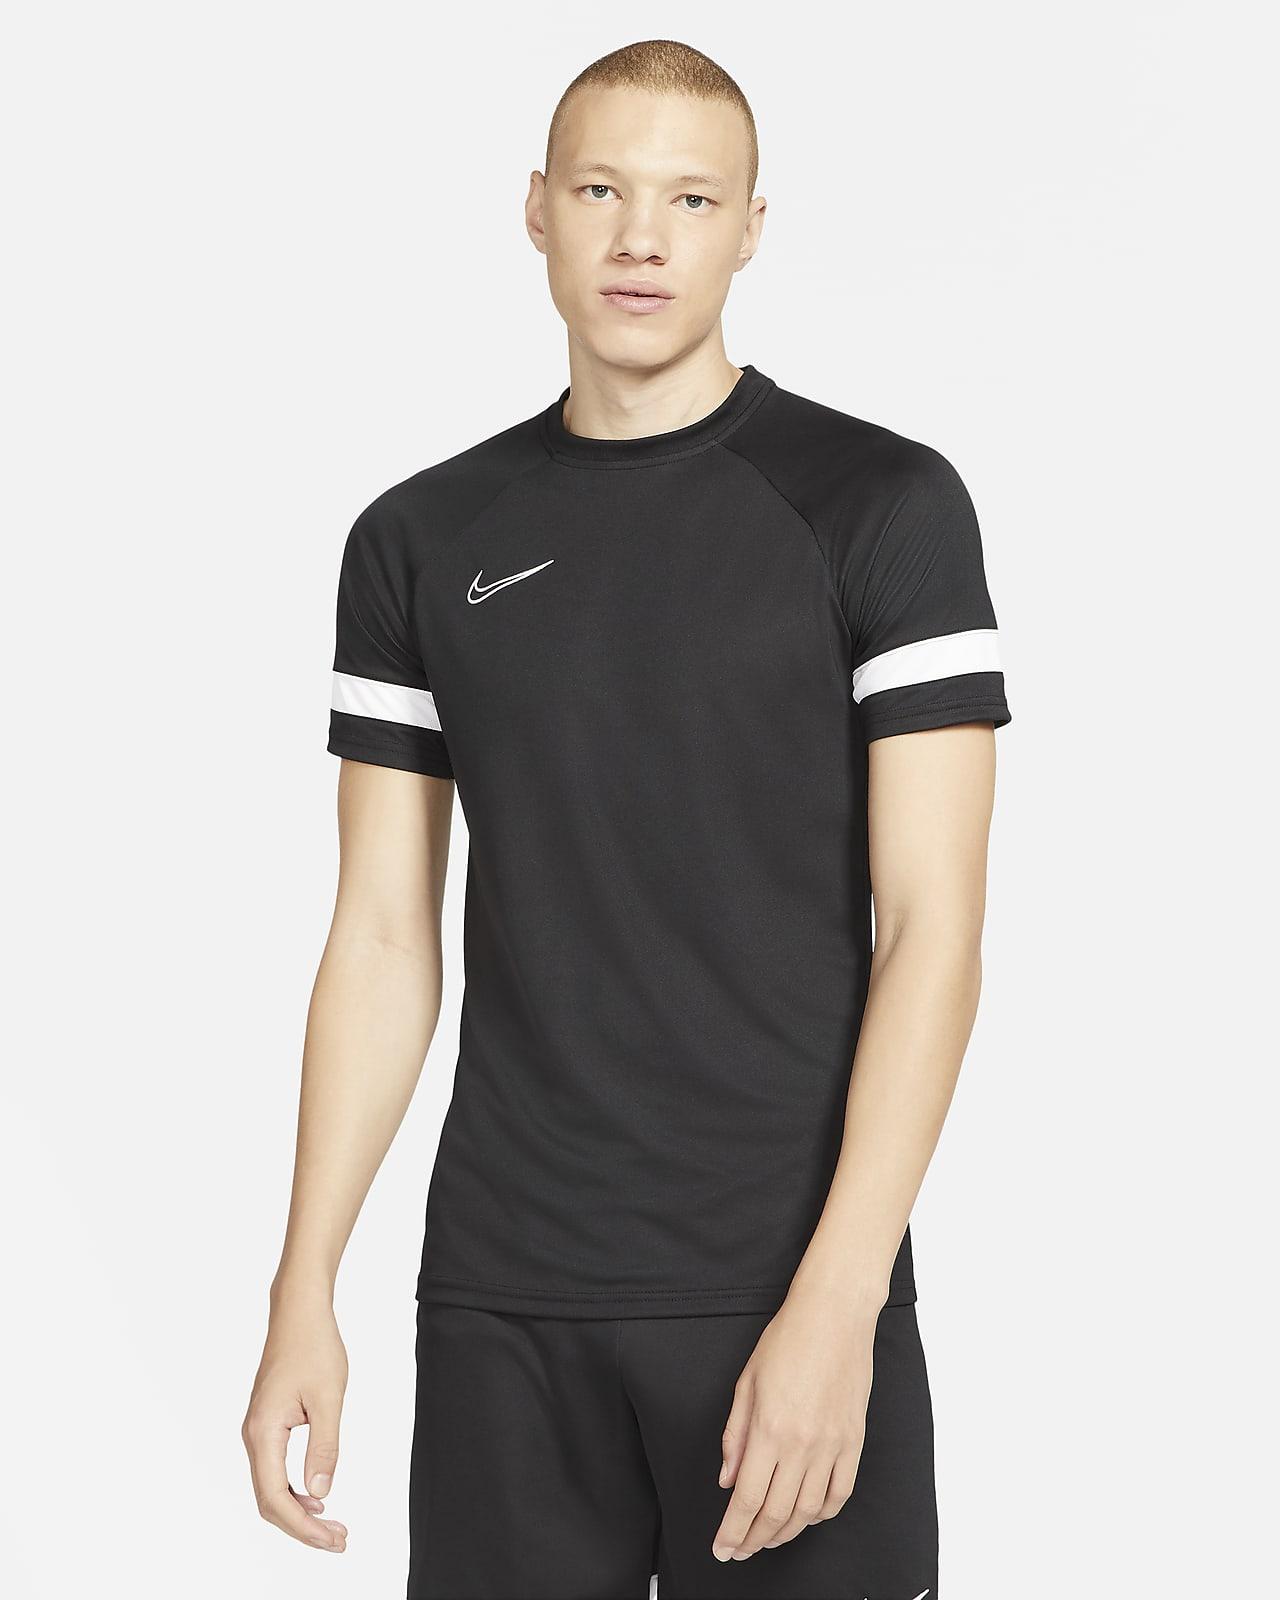 Nike Dri-FIT Academy Men's Short-Sleeve Soccer Top